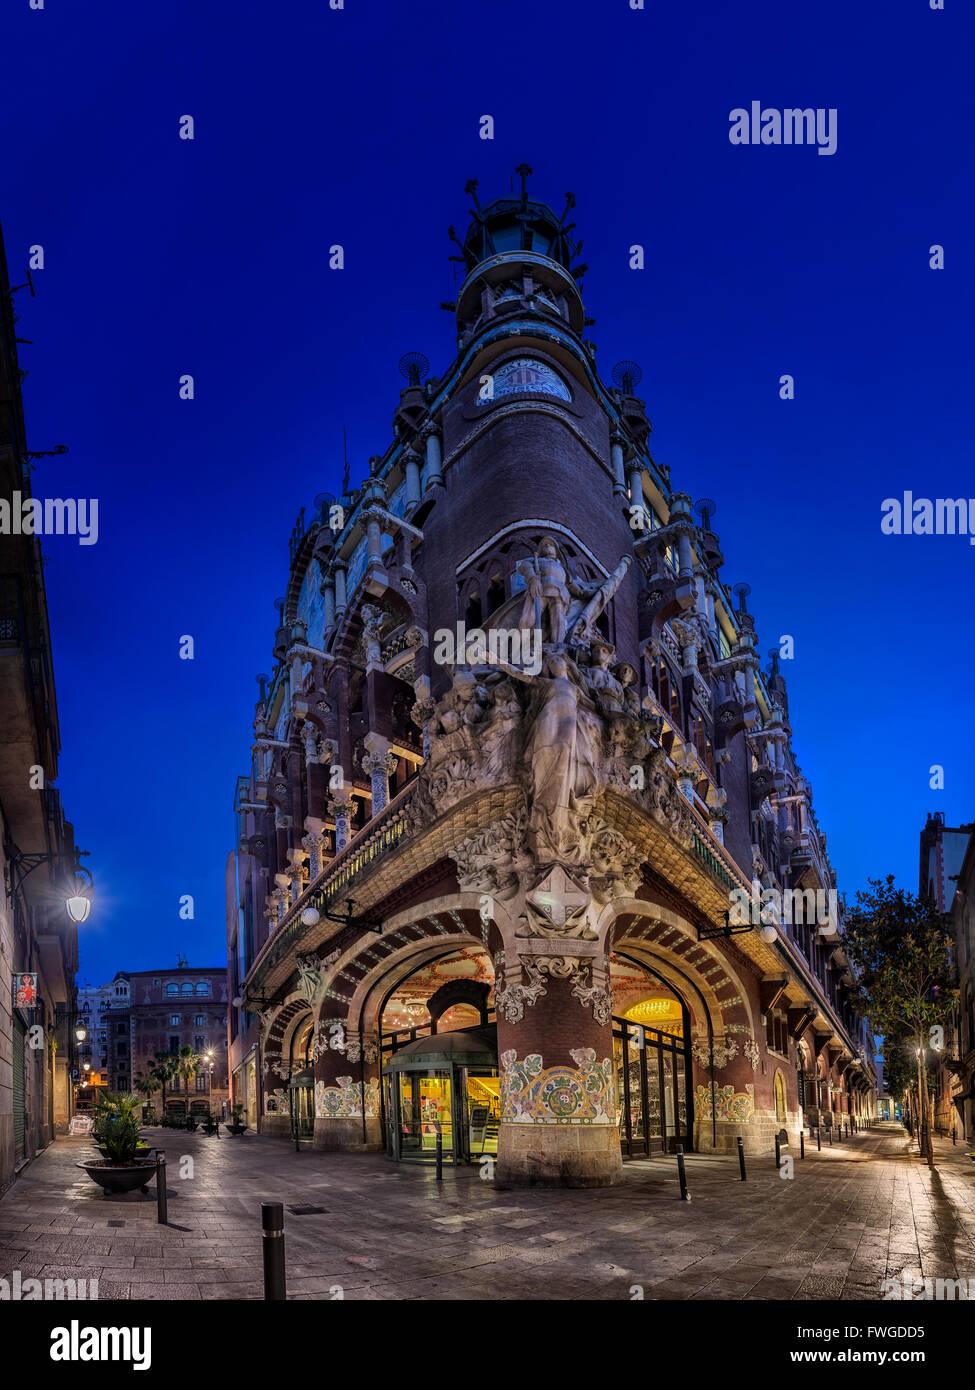 Vista frontal al amanecer del Palau de la Música Catalana en Barcelona Imagen De Stock